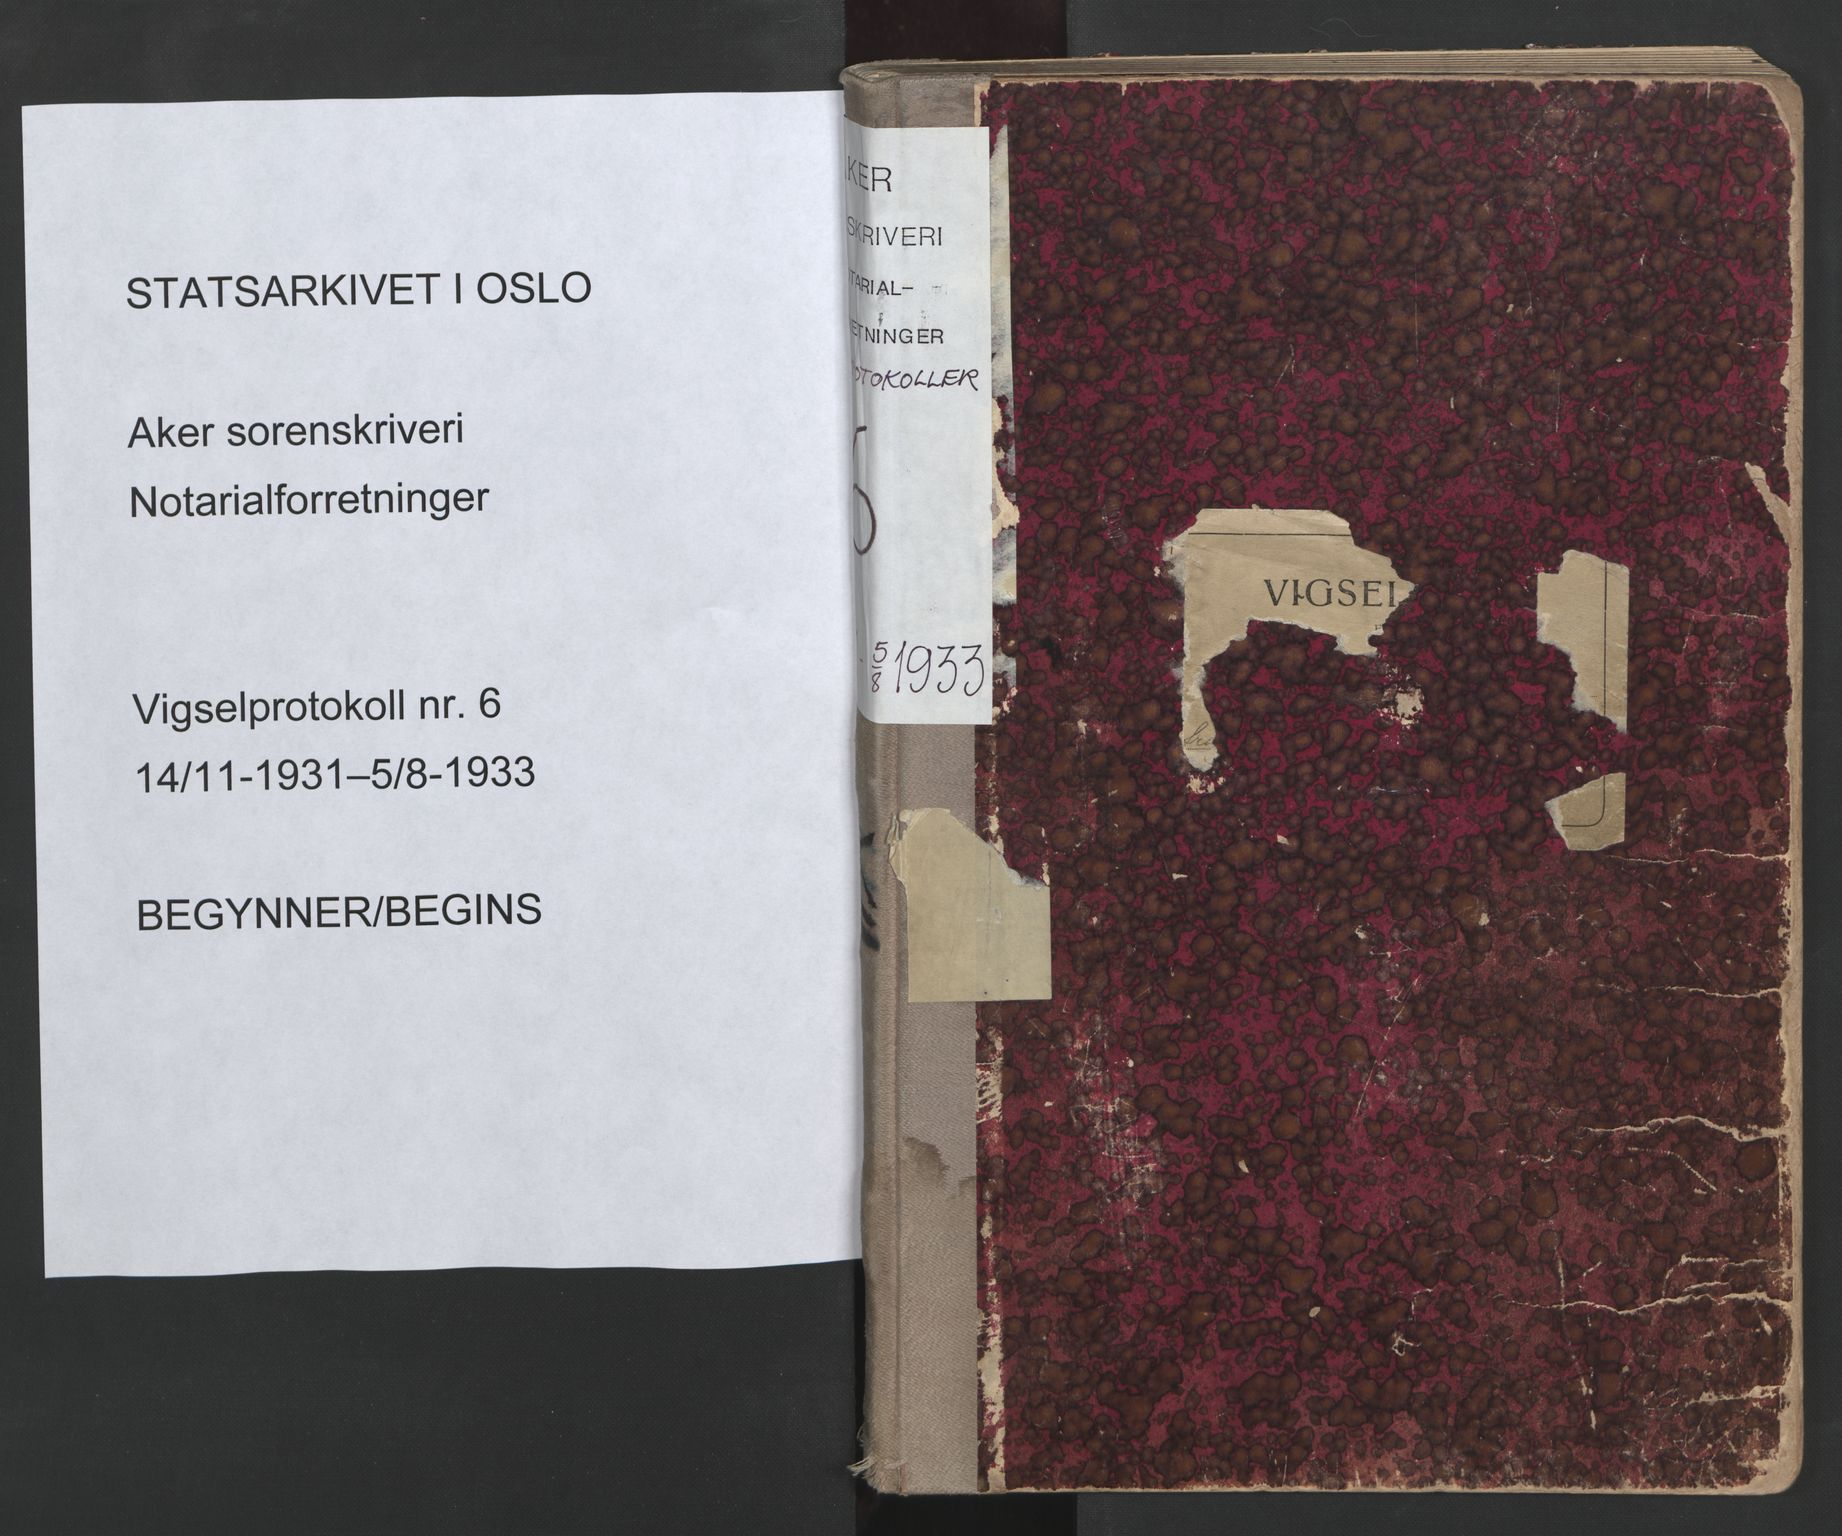 SAO, Aker sorenskriveri, L/Lc/Lcb/L0006: Vigselprotokoll, 1931-1933, s. upaginert